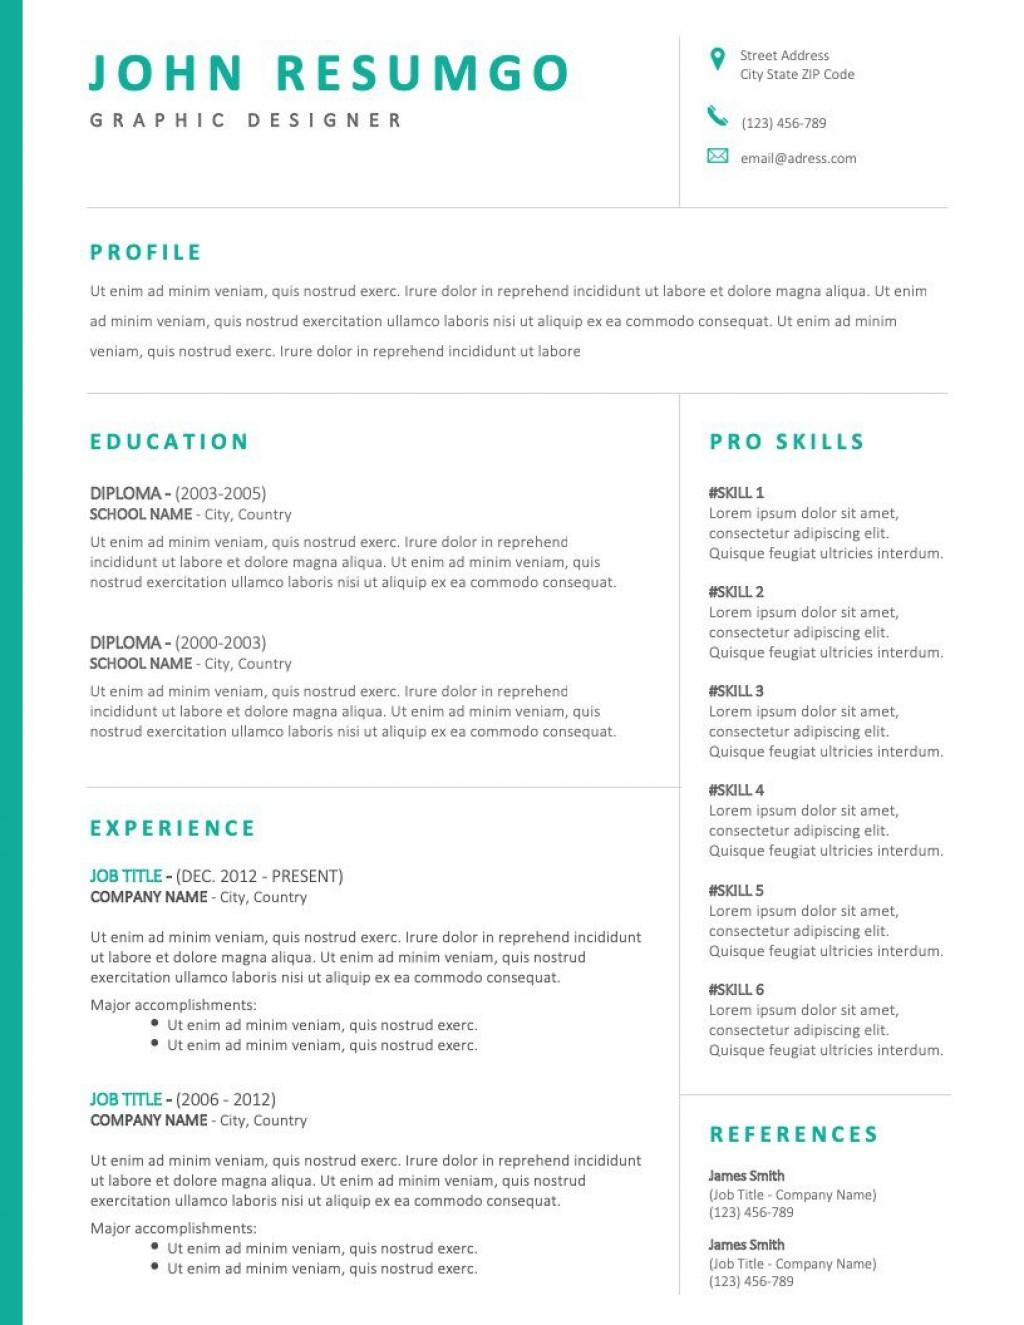 001 Simple Two Column Resume Template Word High Definition  Cv Free MicrosoftLarge